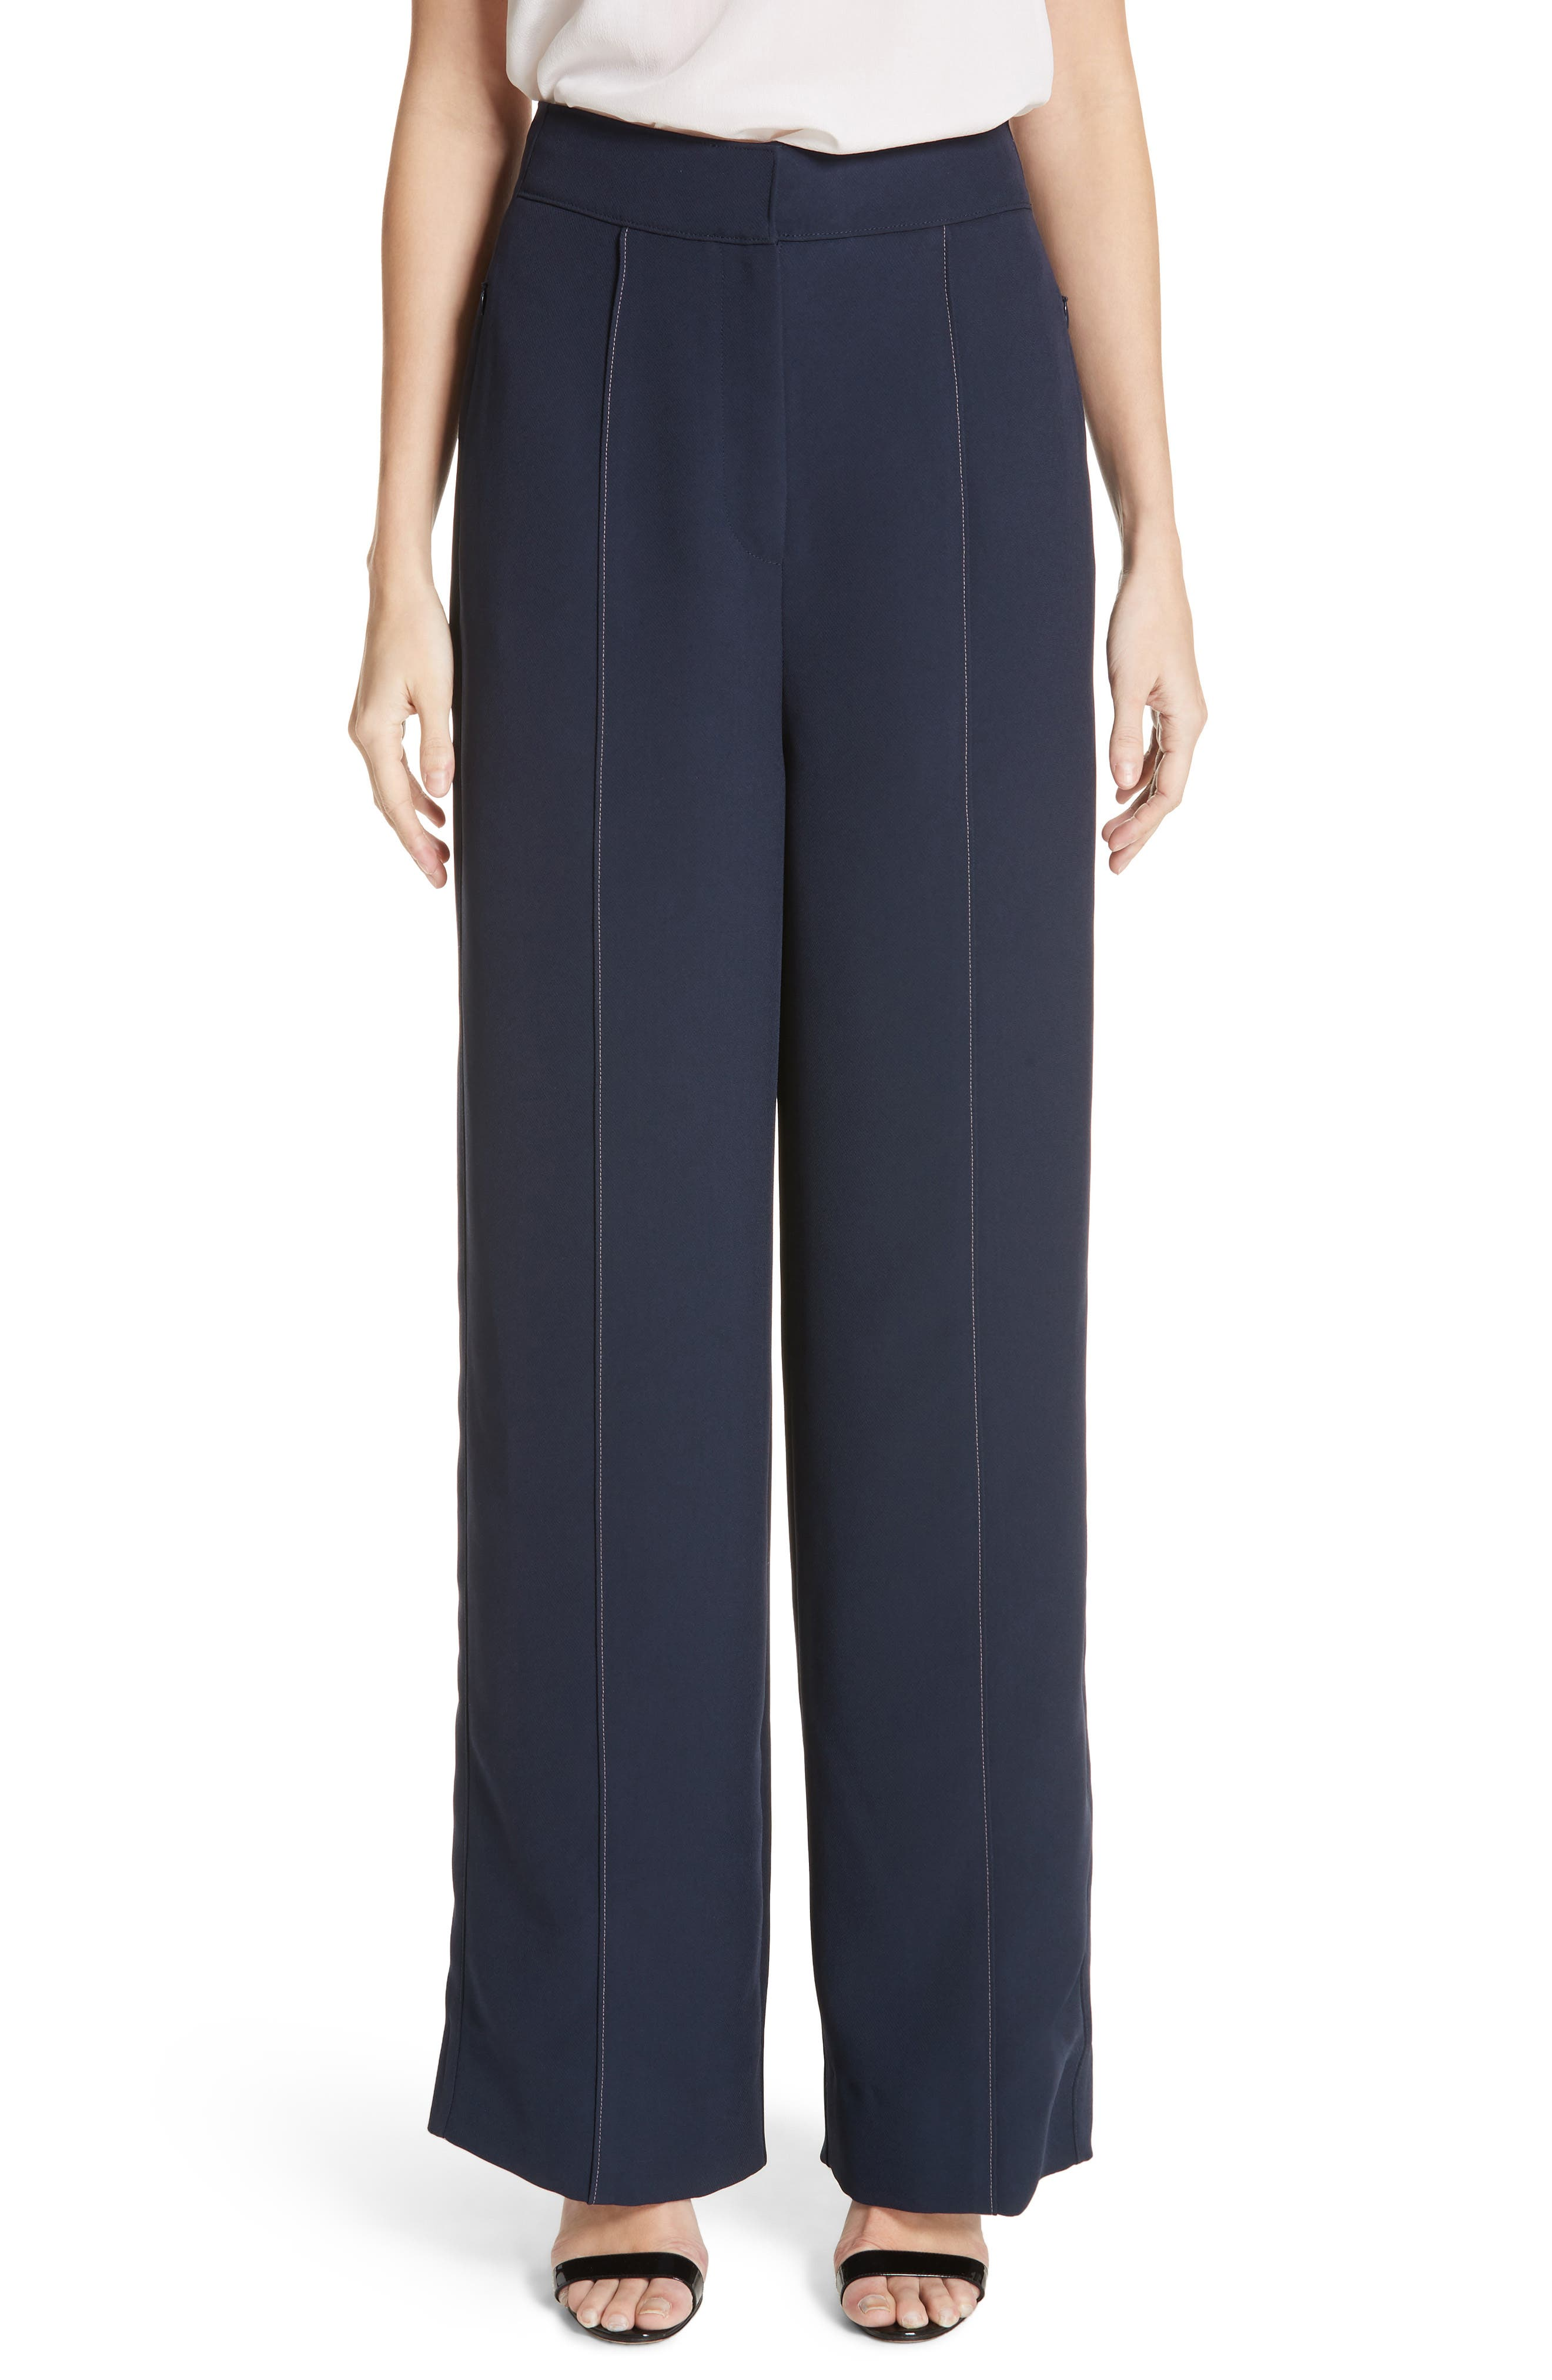 Lapari Pintuck Trousers,                             Main thumbnail 1, color,                             400